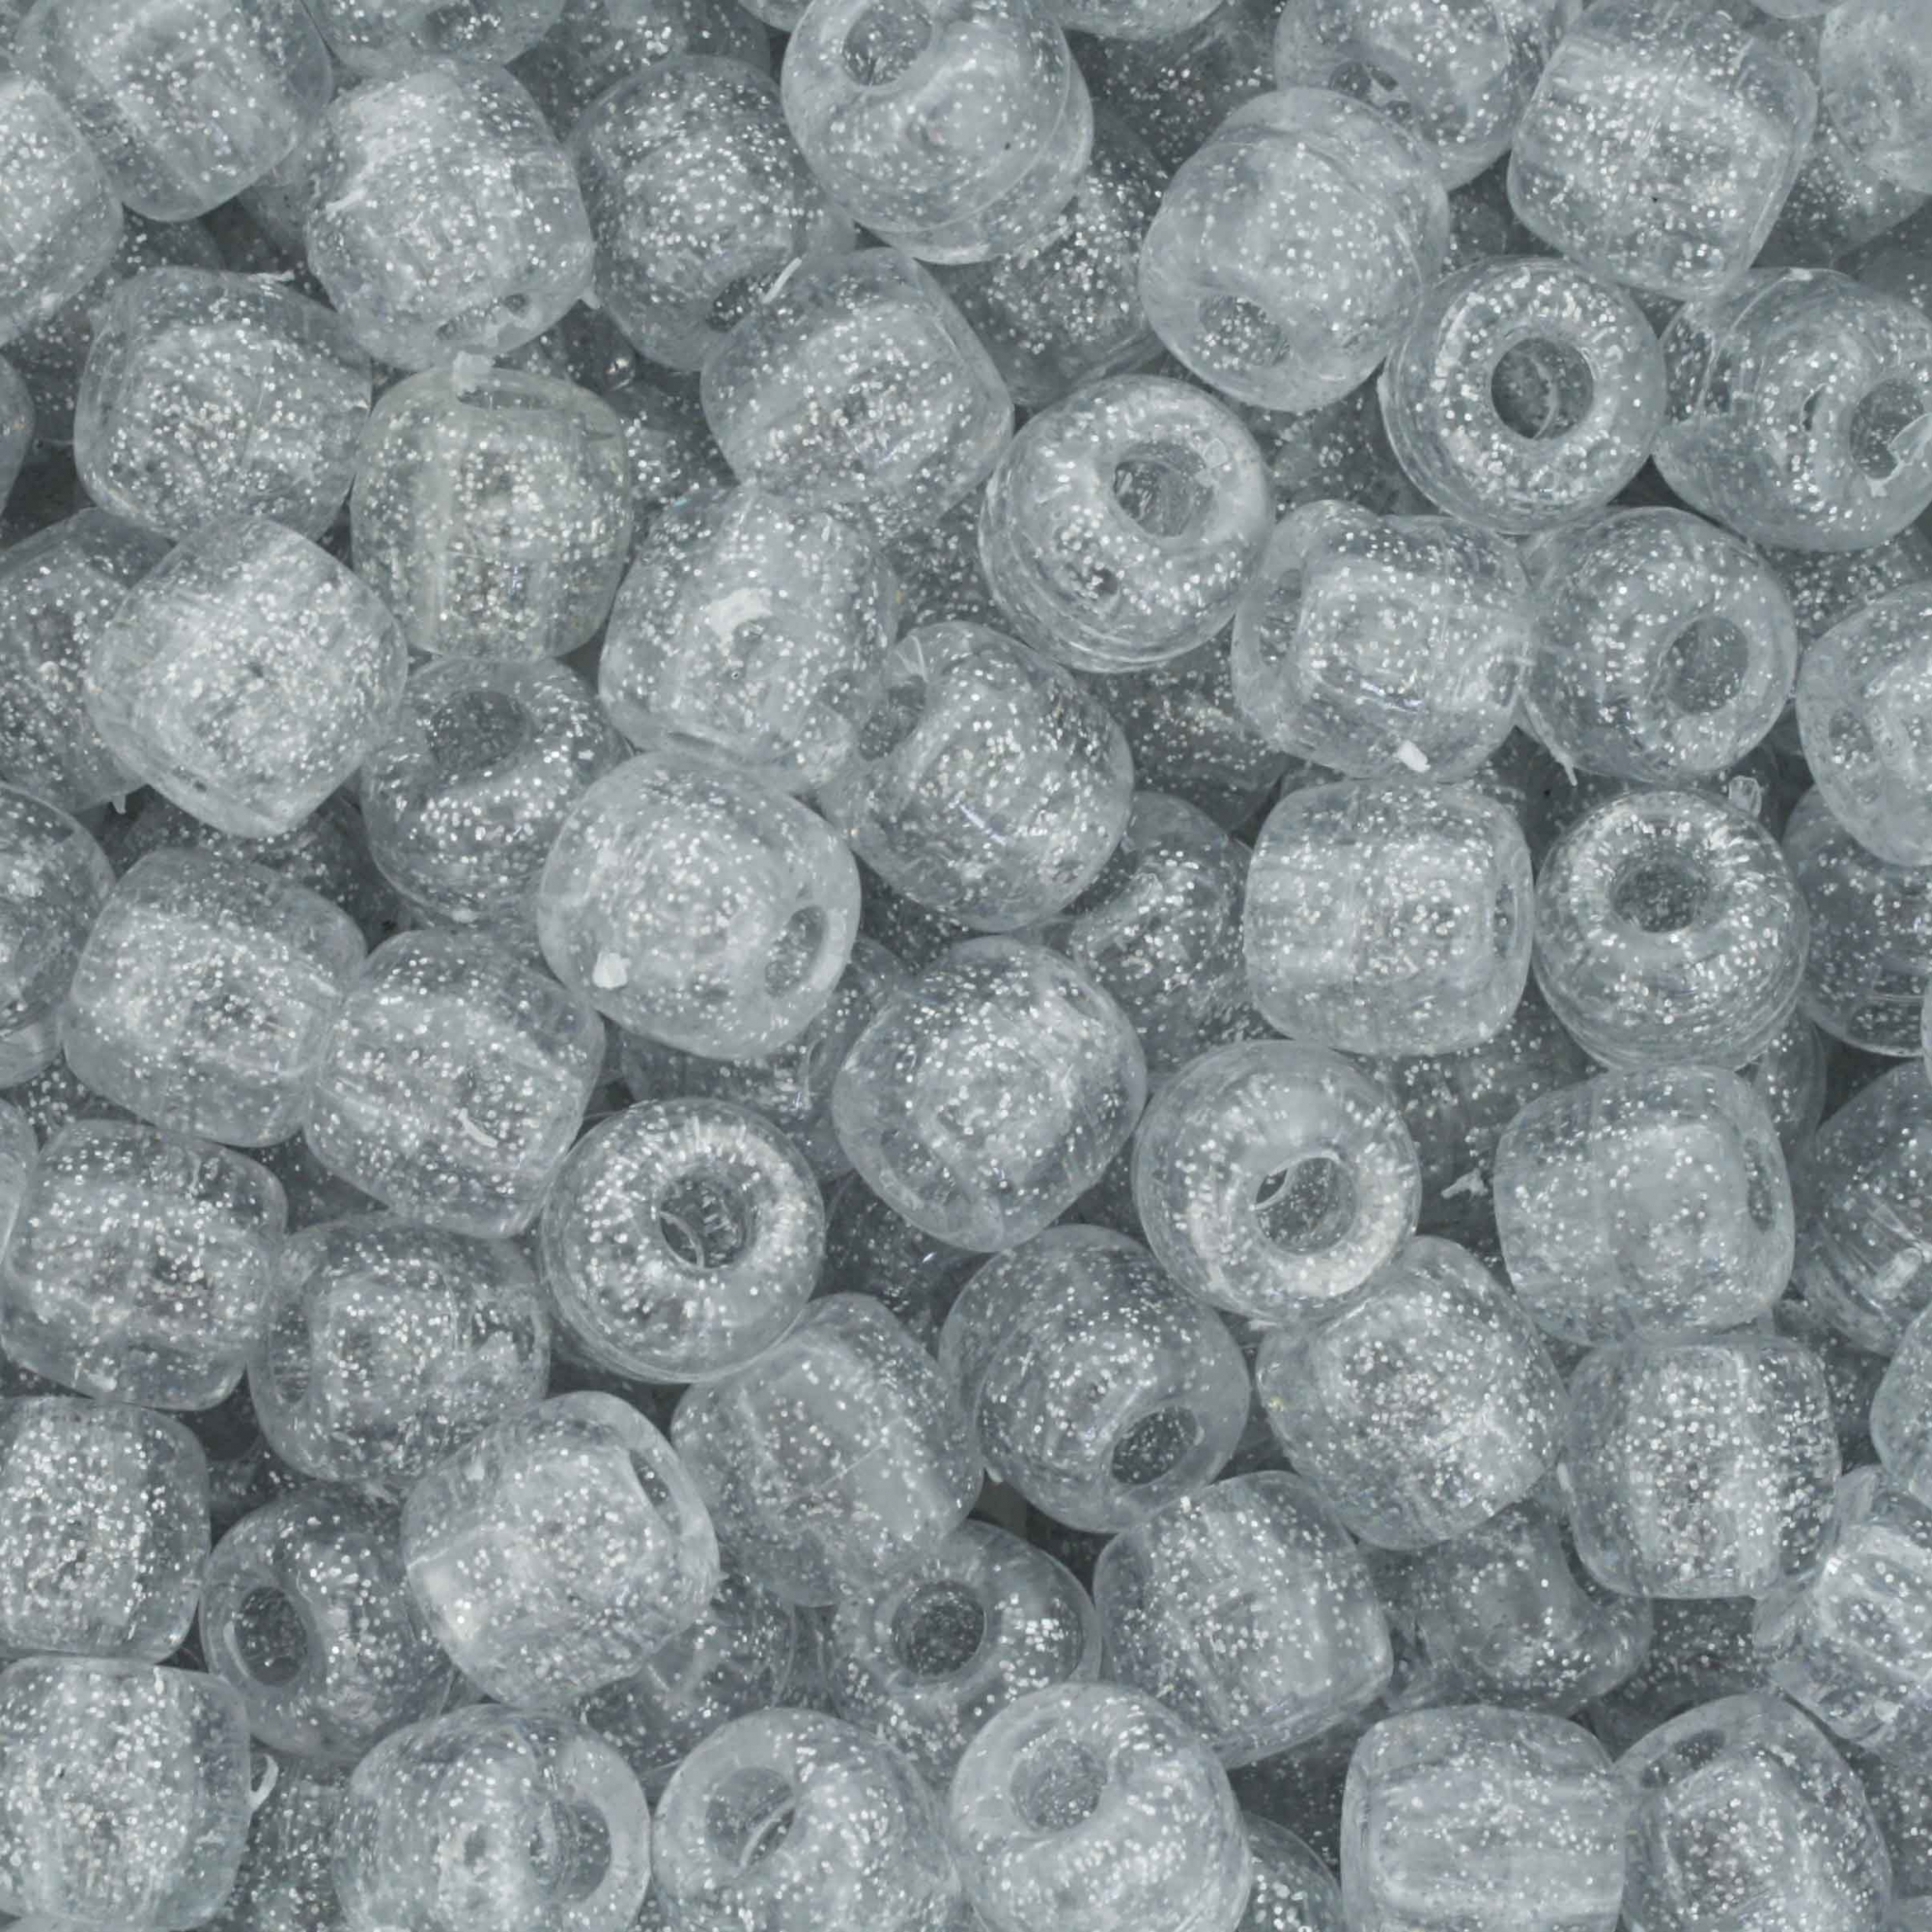 Miçangão Plástico - Tererê® - Glitter Prata  - Stéphanie Bijoux® - Peças para Bijuterias e Artesanato